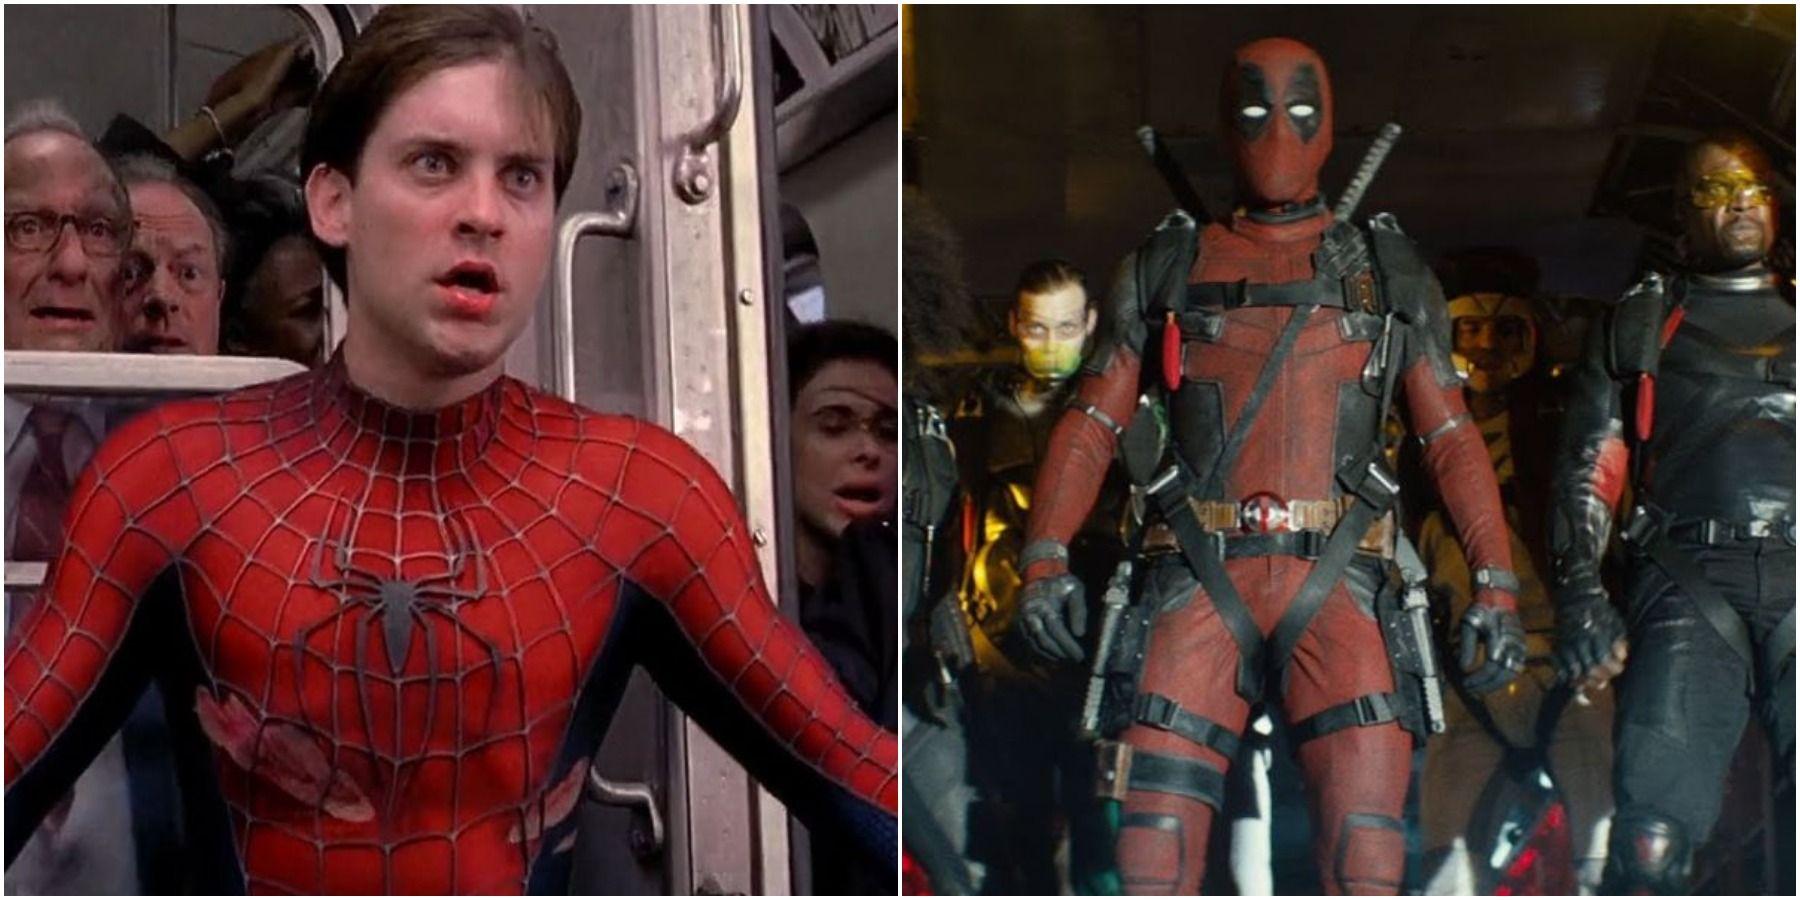 10 Best Non-MCU Marvel Superhero Movies (According To IMDb)